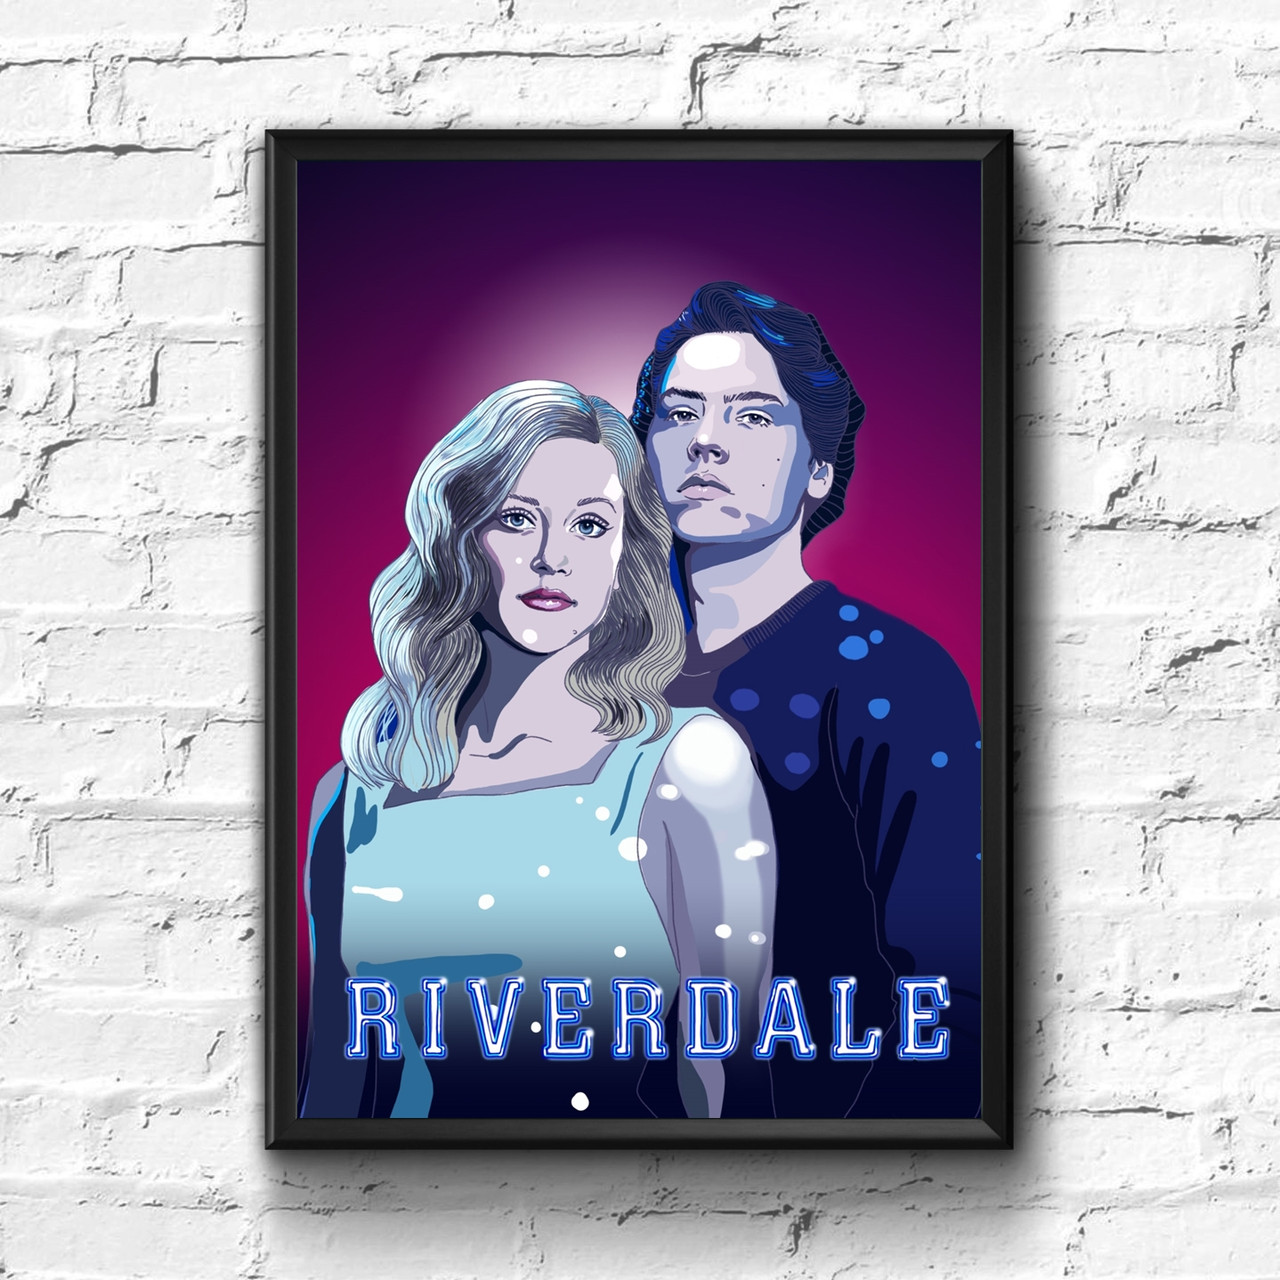 Постер с рамкой Riverdale #4